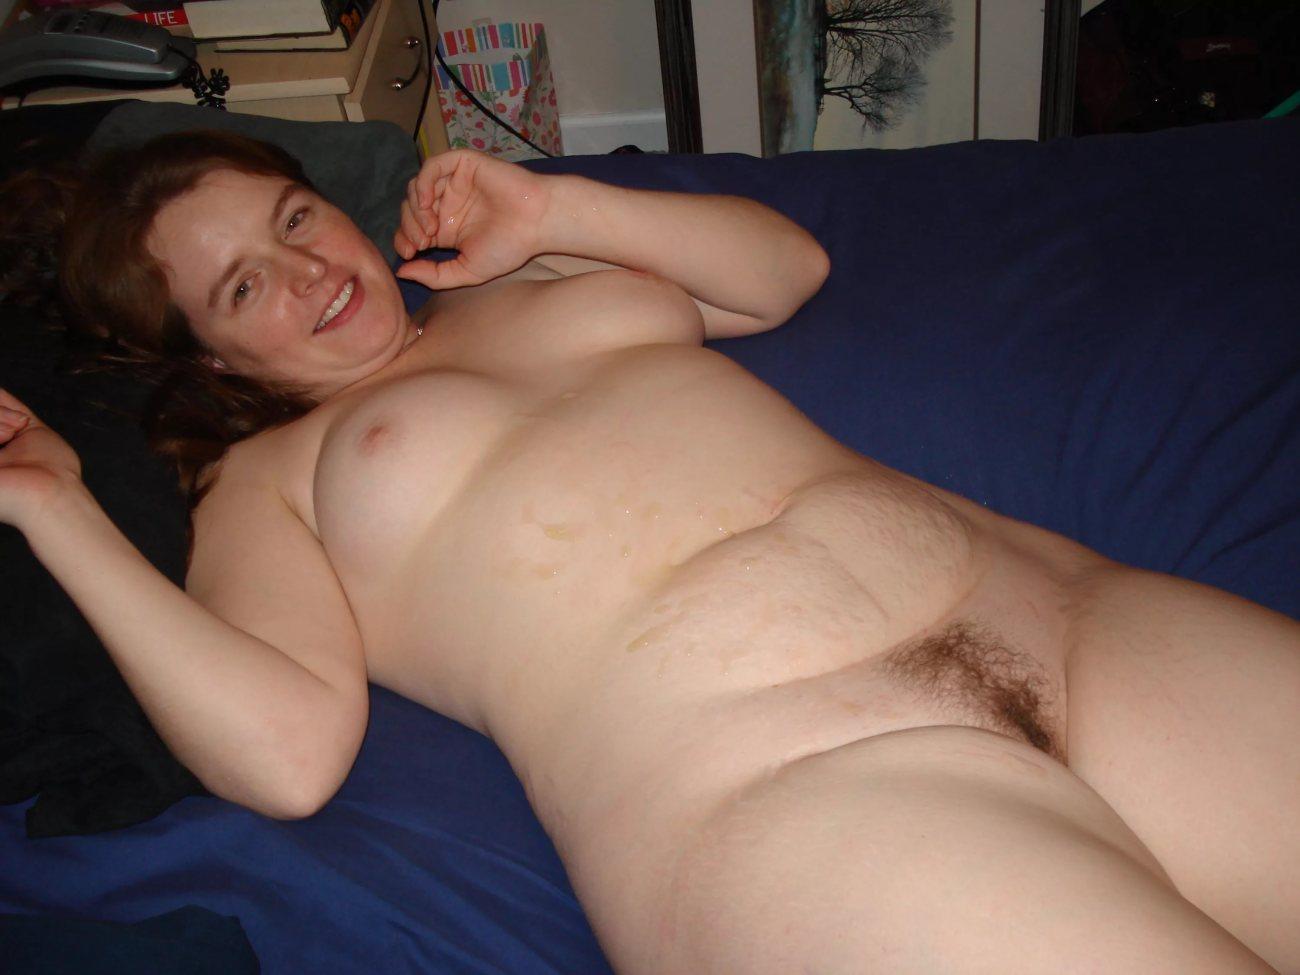 Nude Lush Wifey  Pics HQ